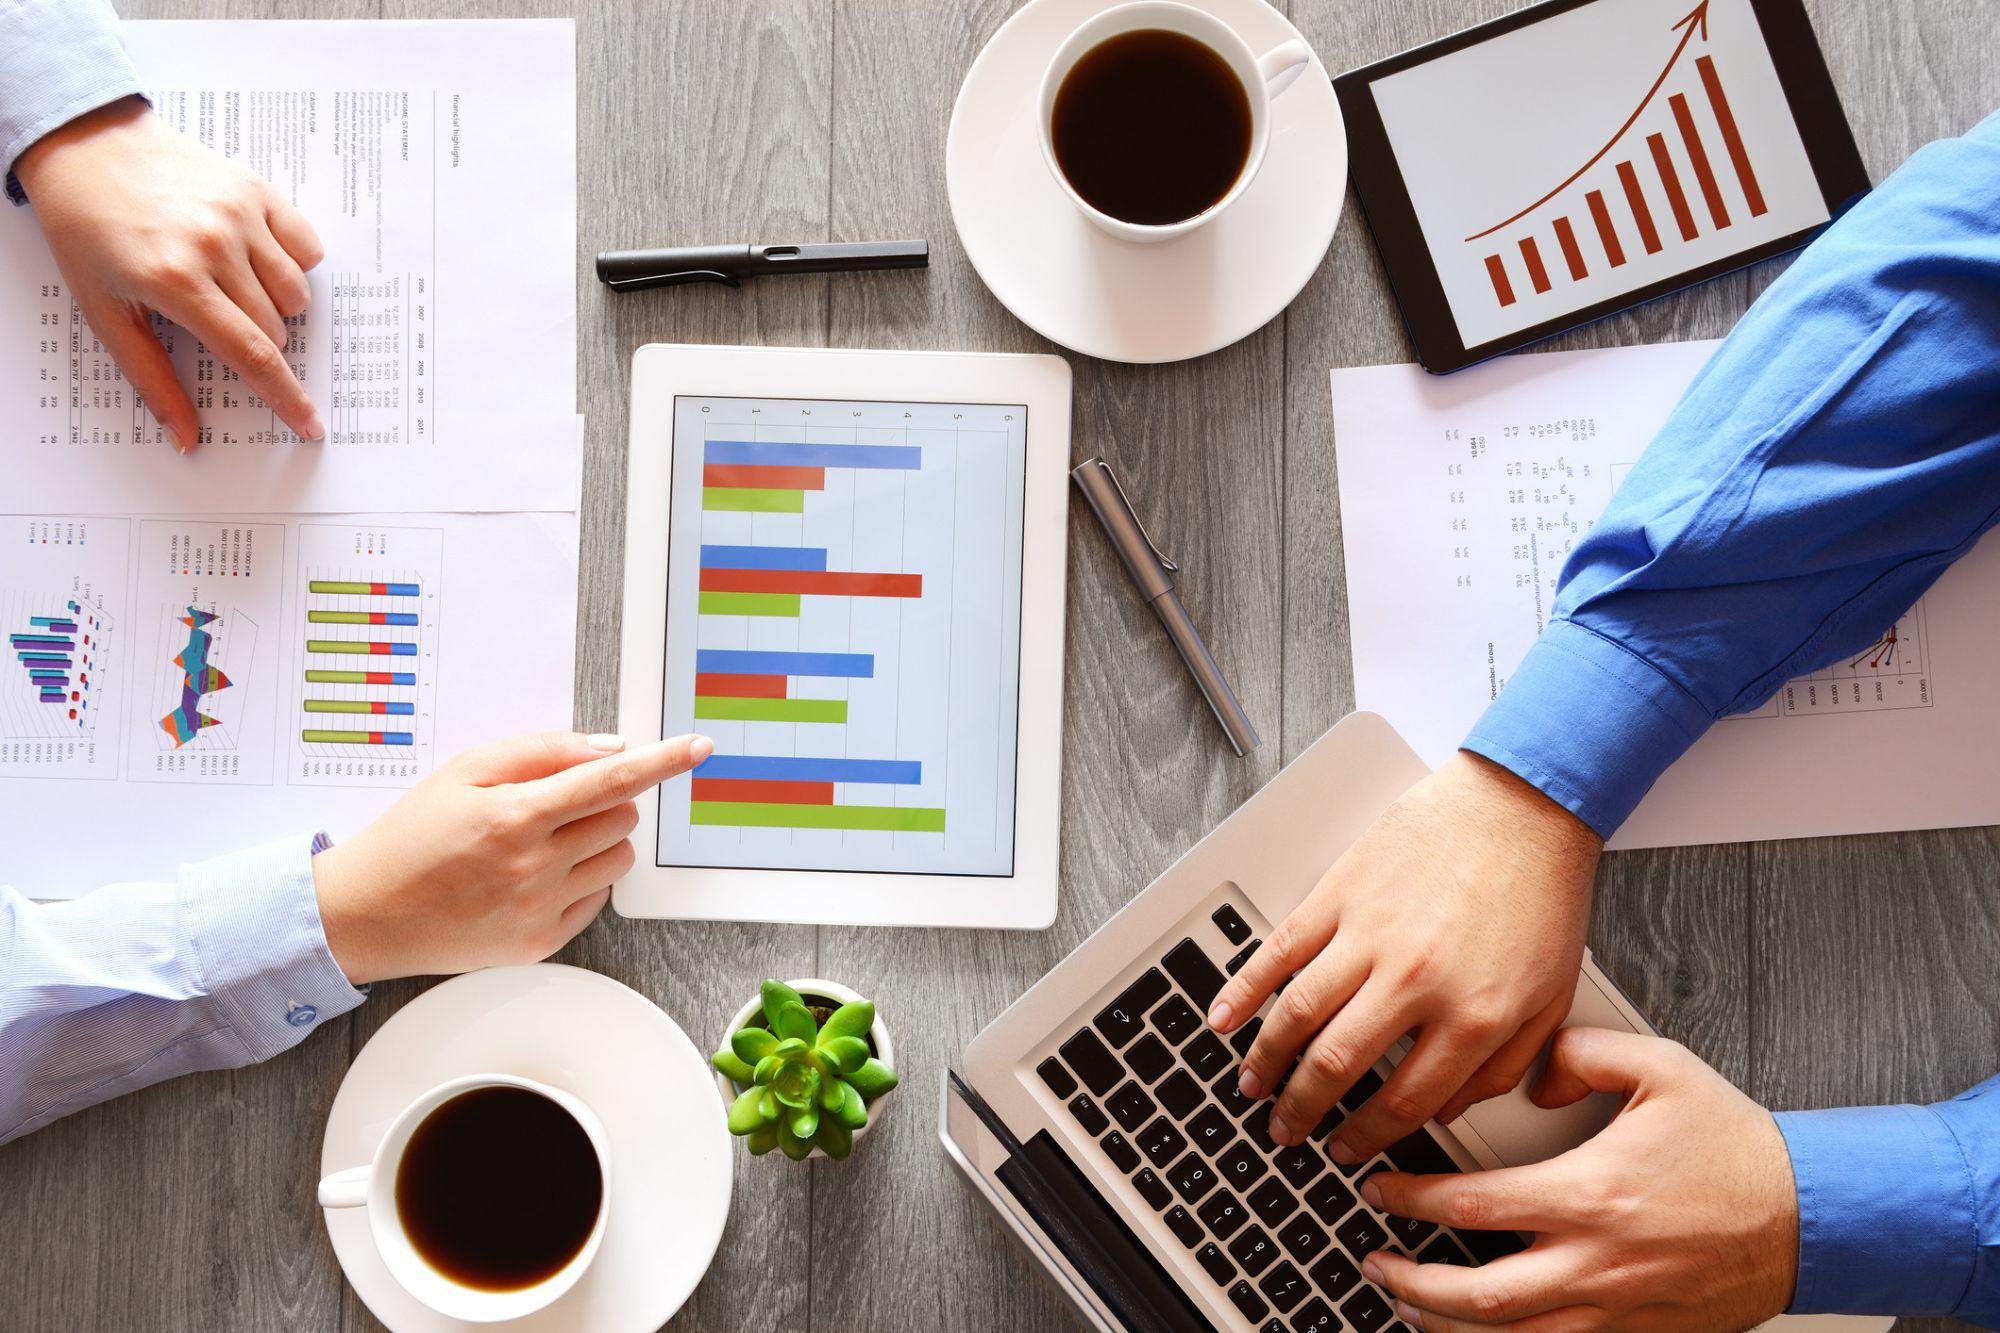 Relatórios financeiros - Argo Solutions - Simplifying your journey